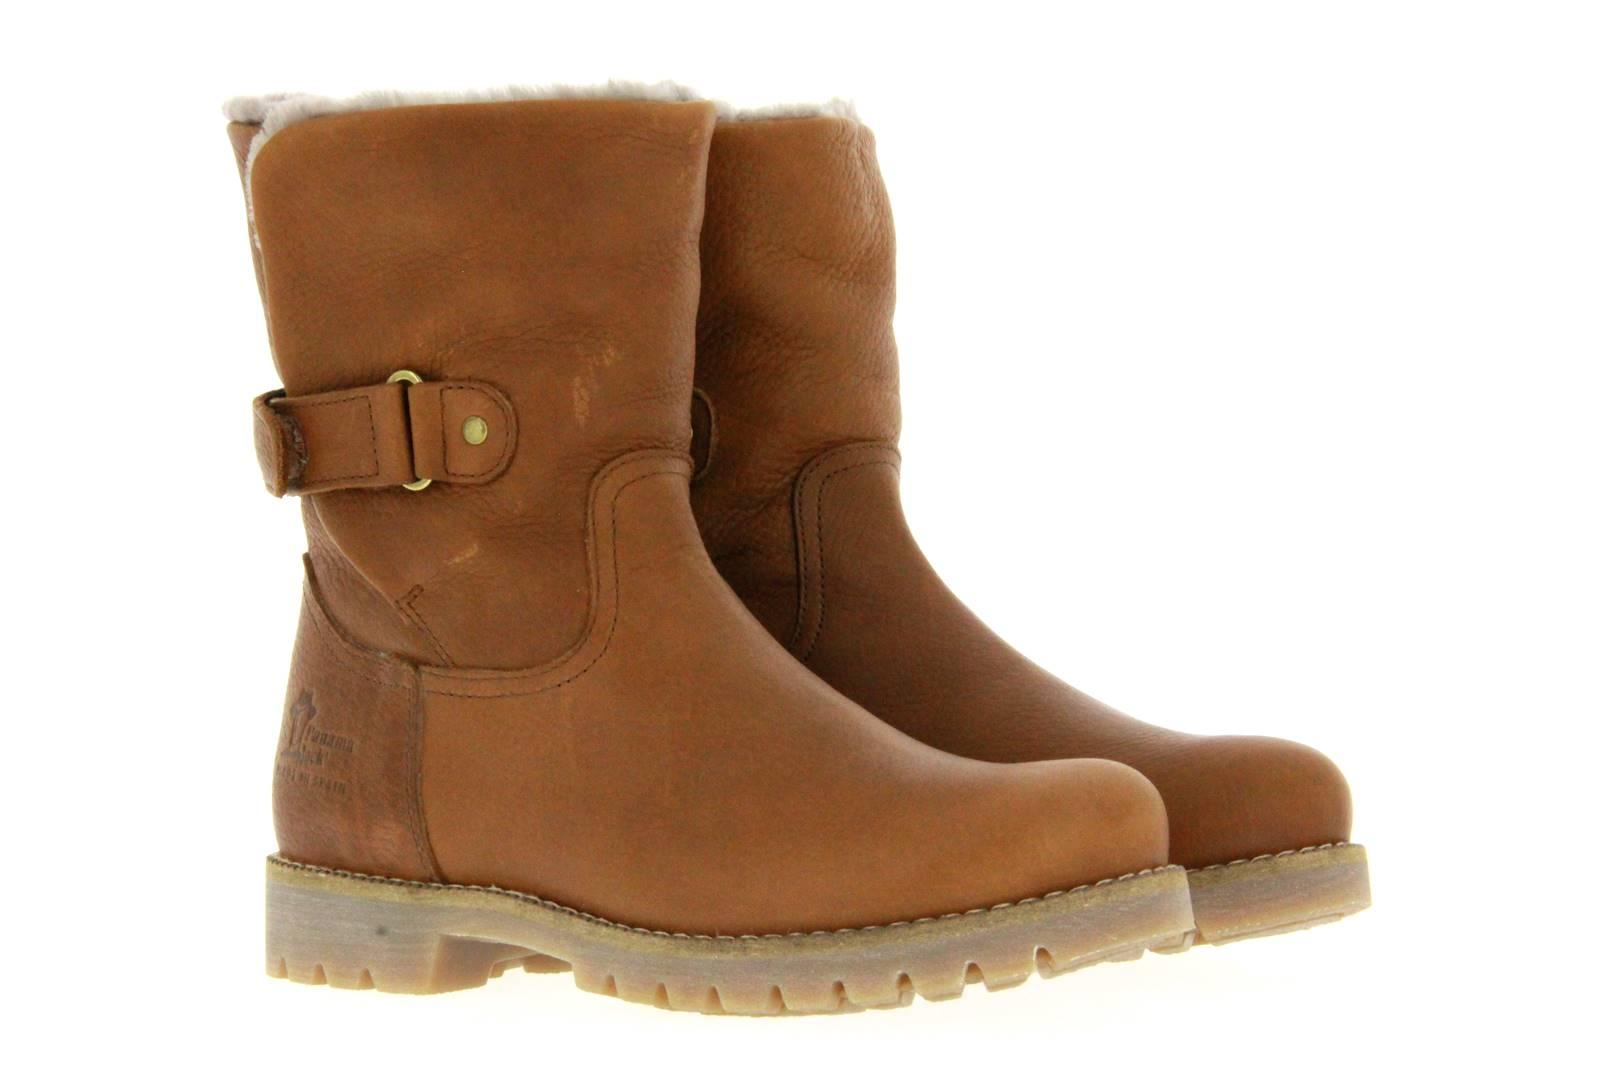 Panama Jack ankle boots lined FELINA IGLOO B4 NAPPA GRASS CUERO BARK